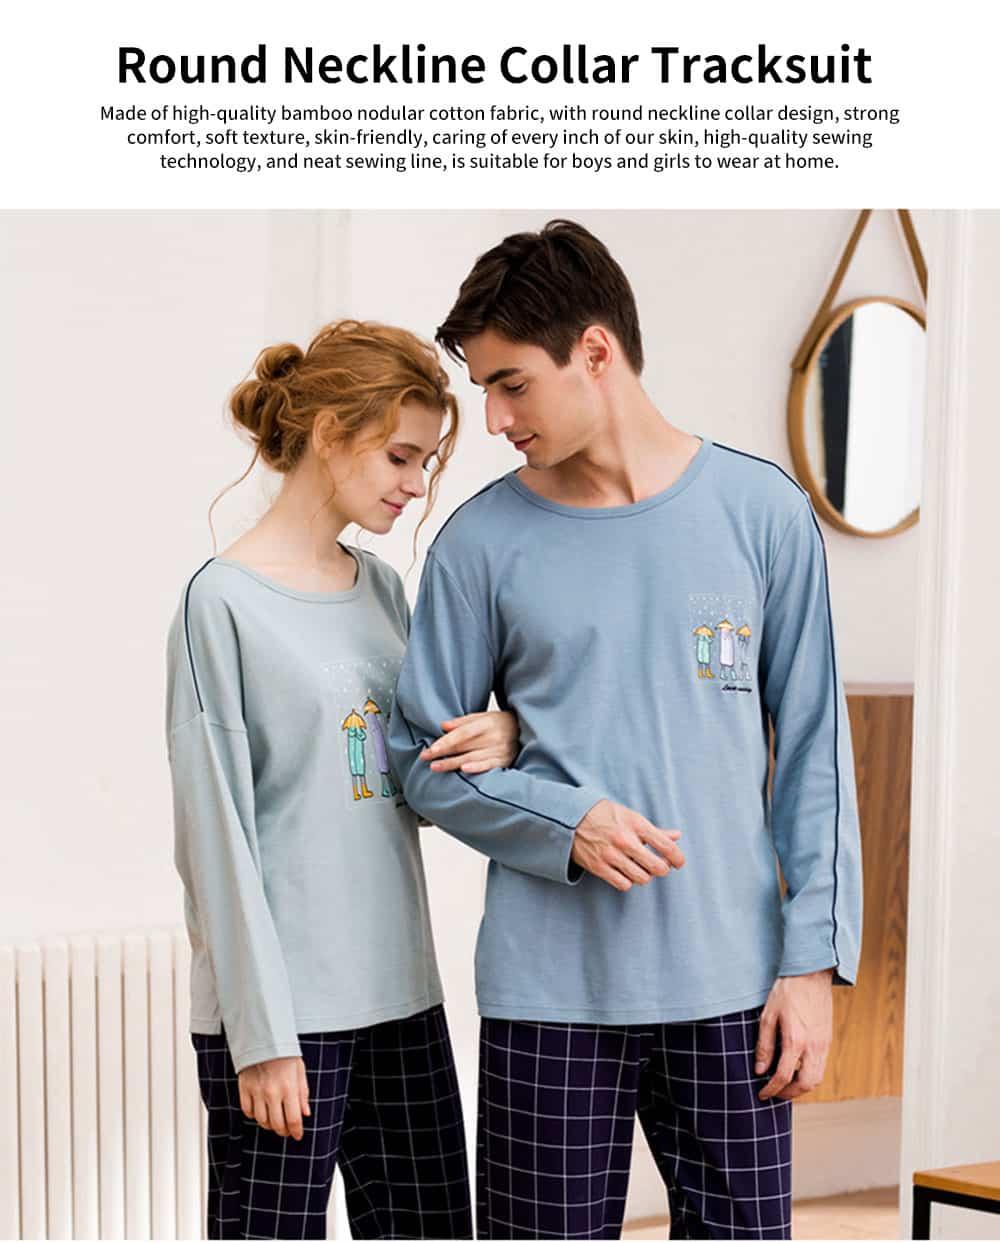 Cartoon Long-sleeved Couple Pajamas, Bamboo Nodular Cotton Round Neckline Collar Tracksuit 0